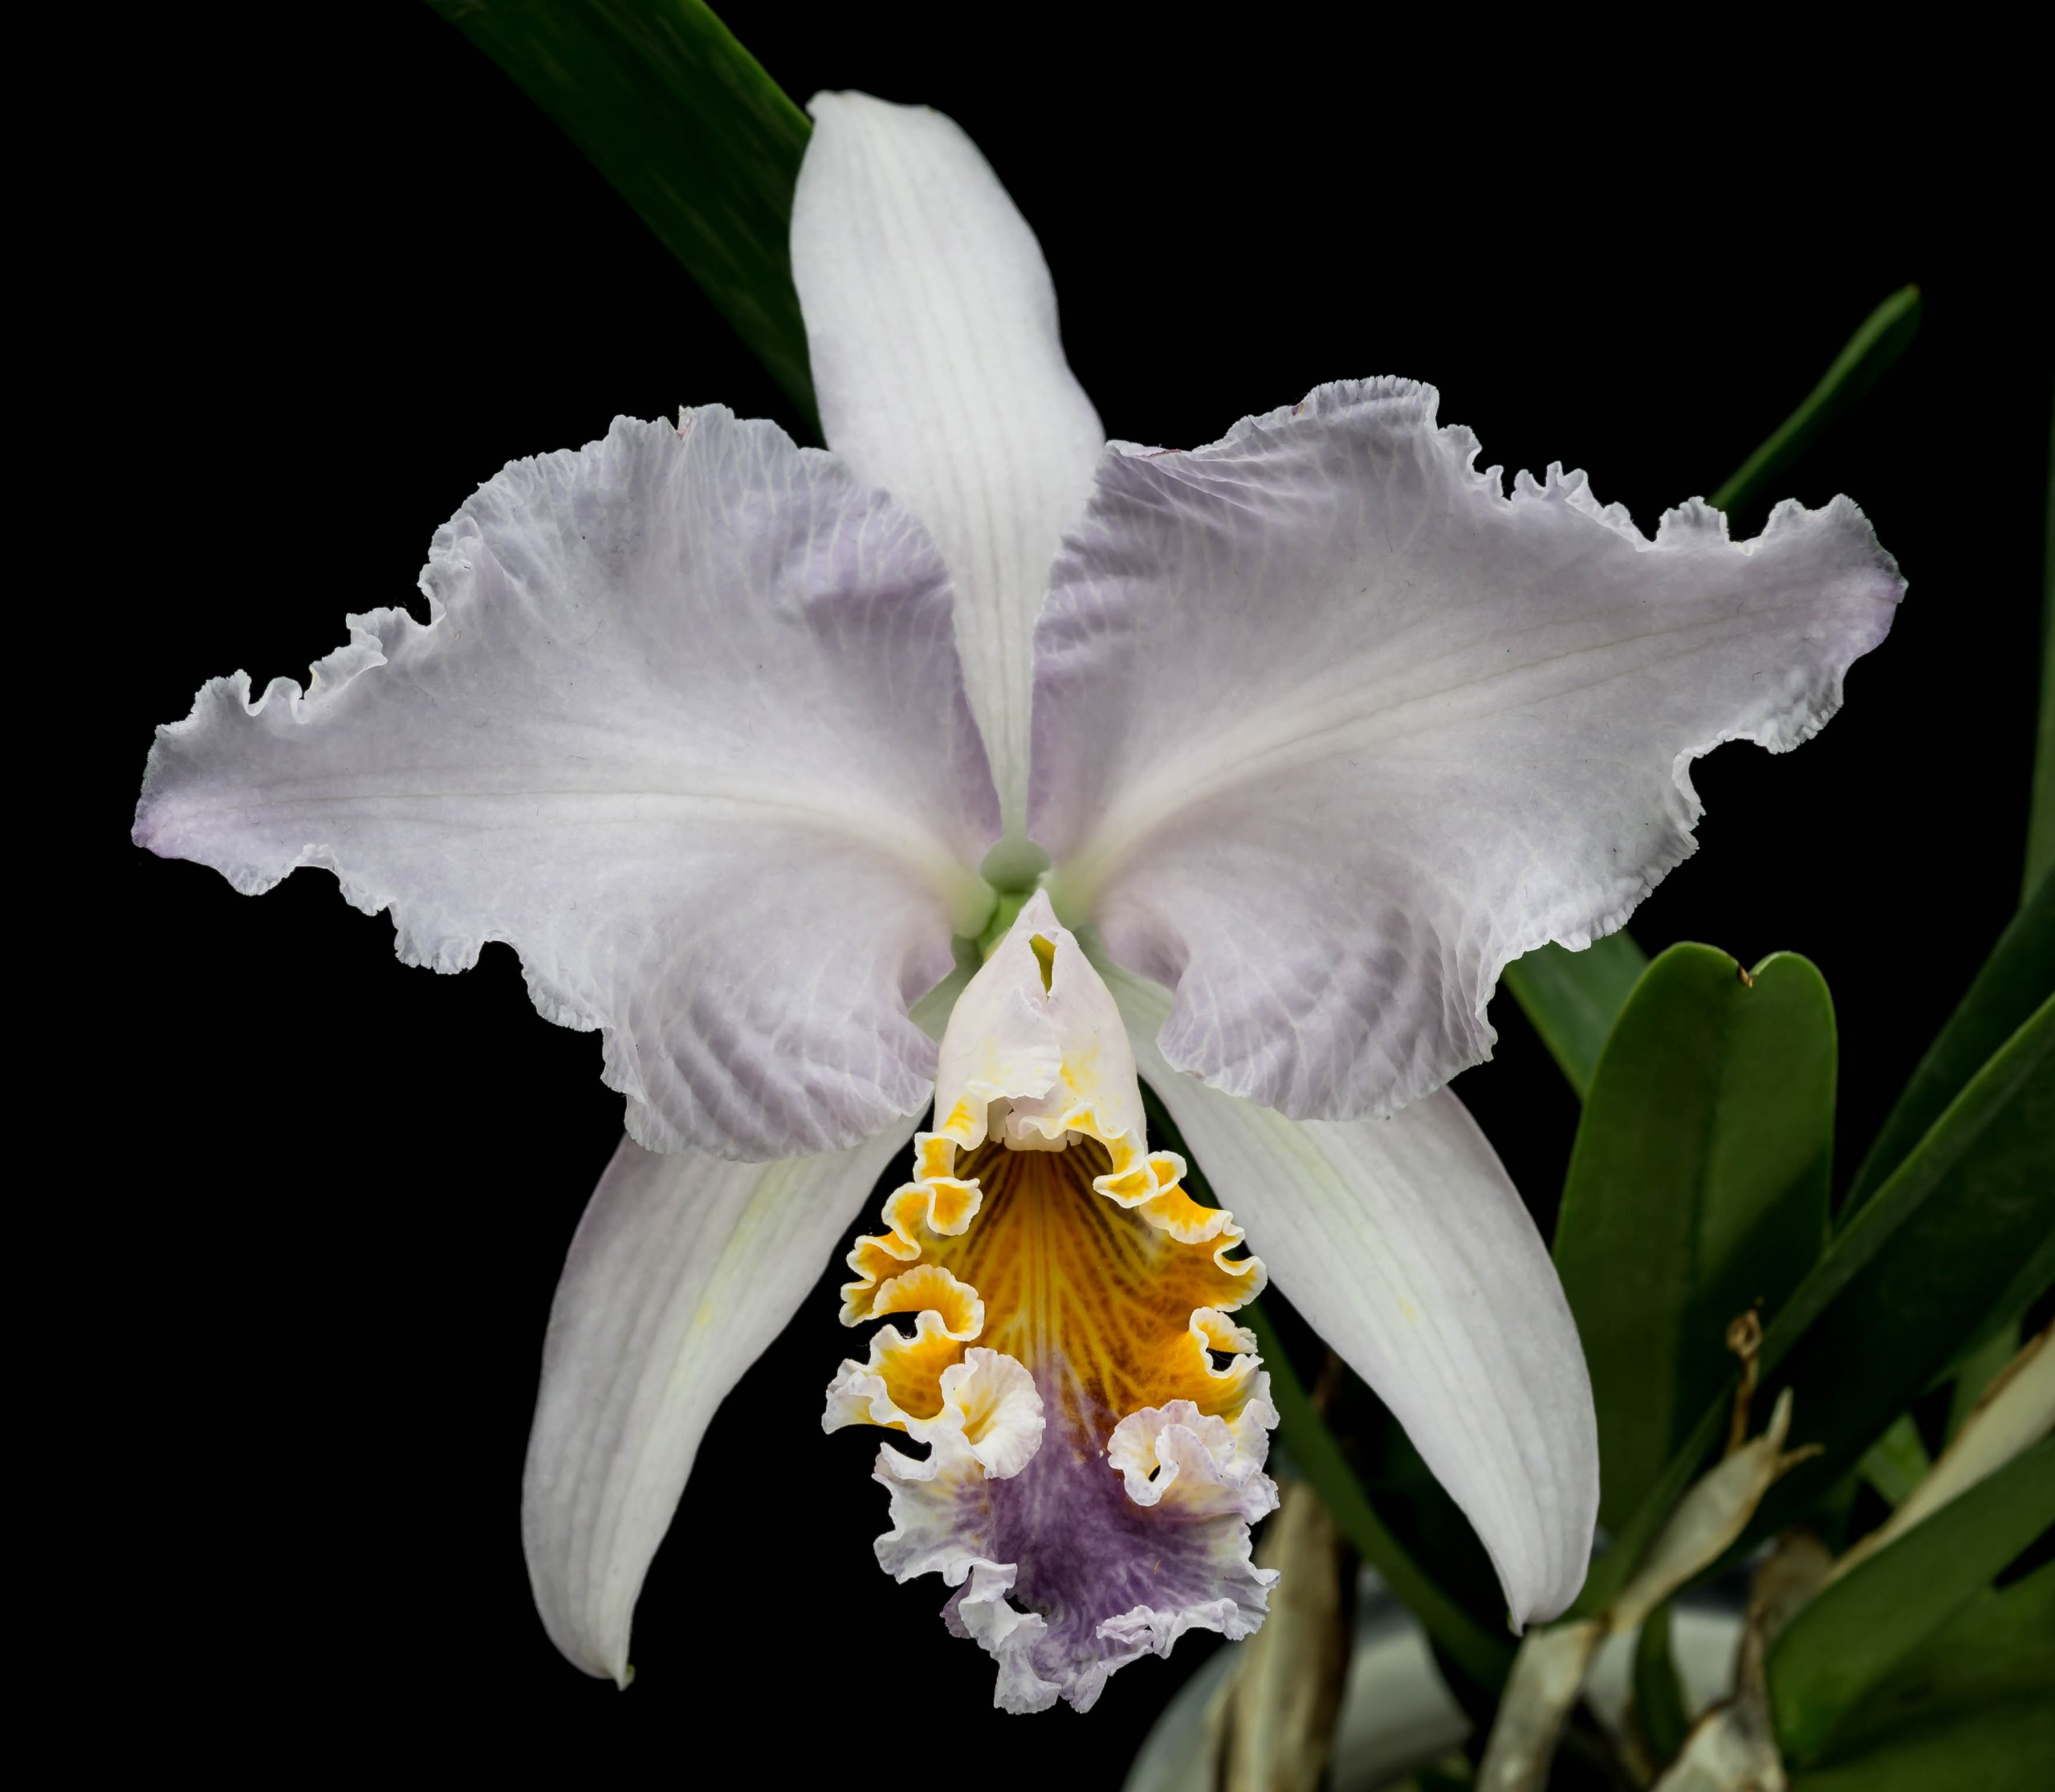 16052021 Cattleya mossiae var. coerulea 1 (1).jpg